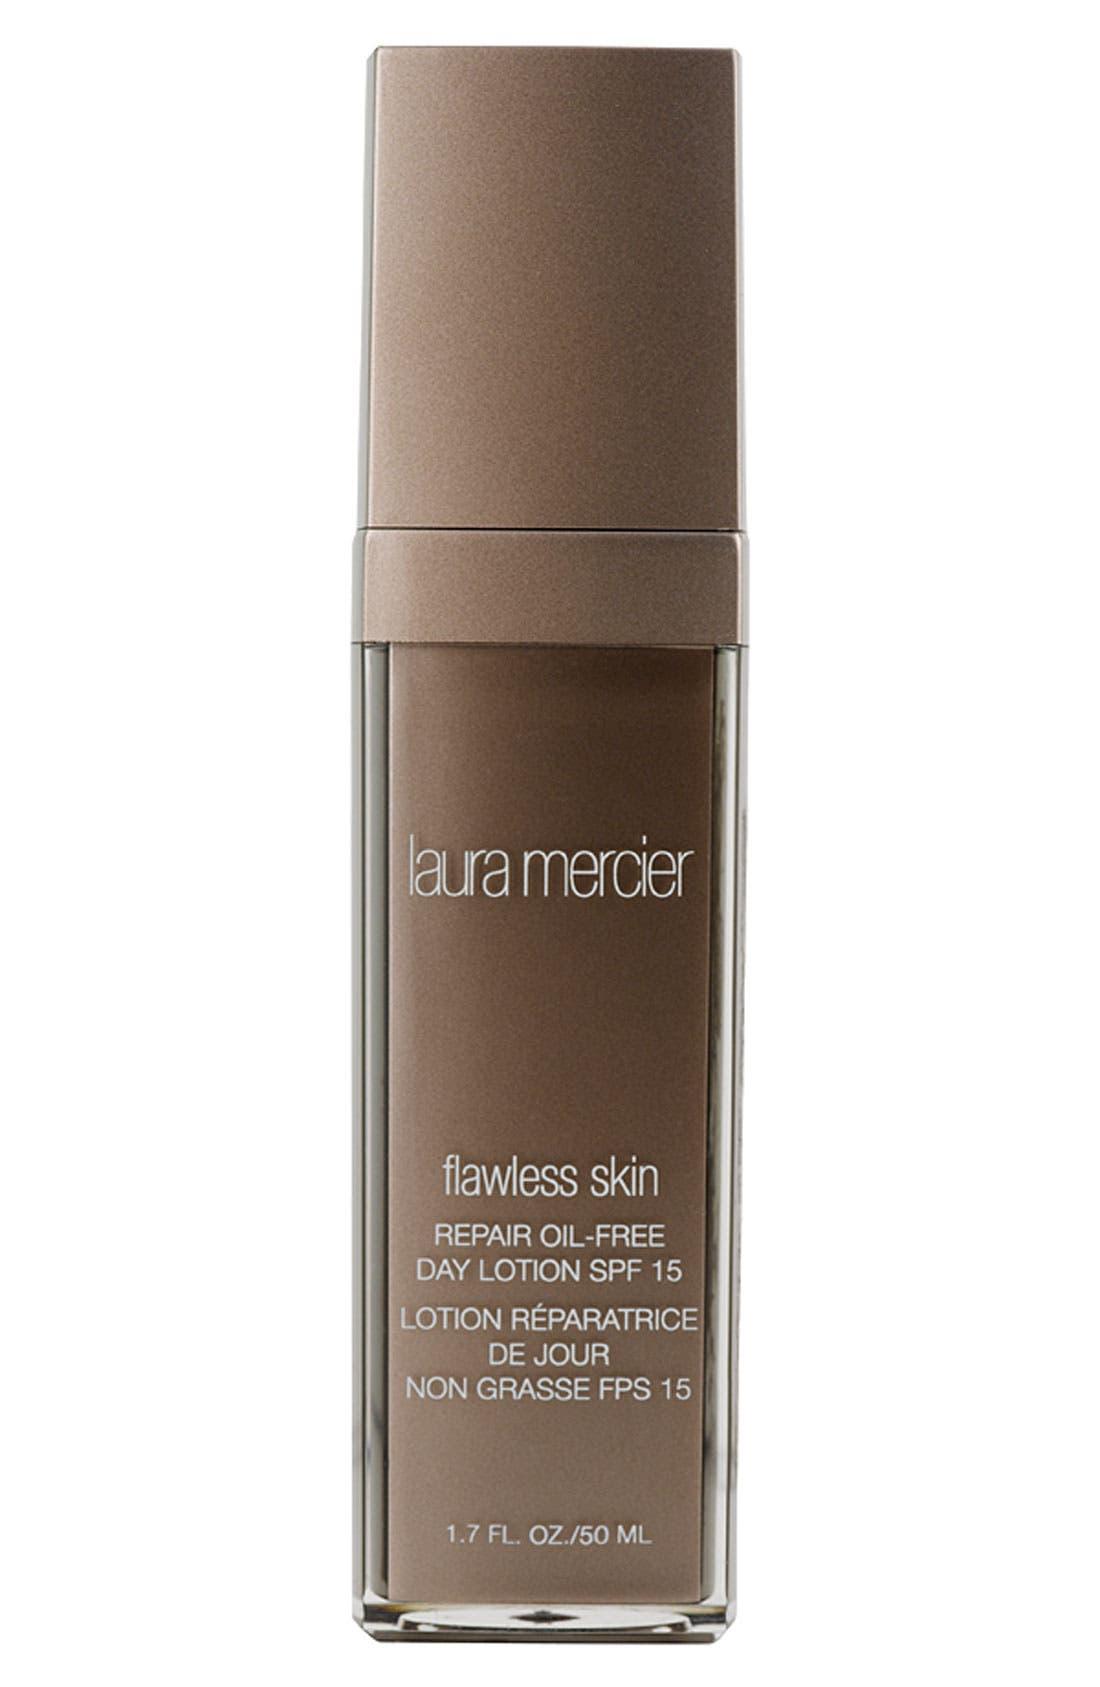 LAURA MERCIER, 'Flawless Skin Repair' Oil-Free Day Lotion SPF 15, Main thumbnail 1, color, NO COLOR